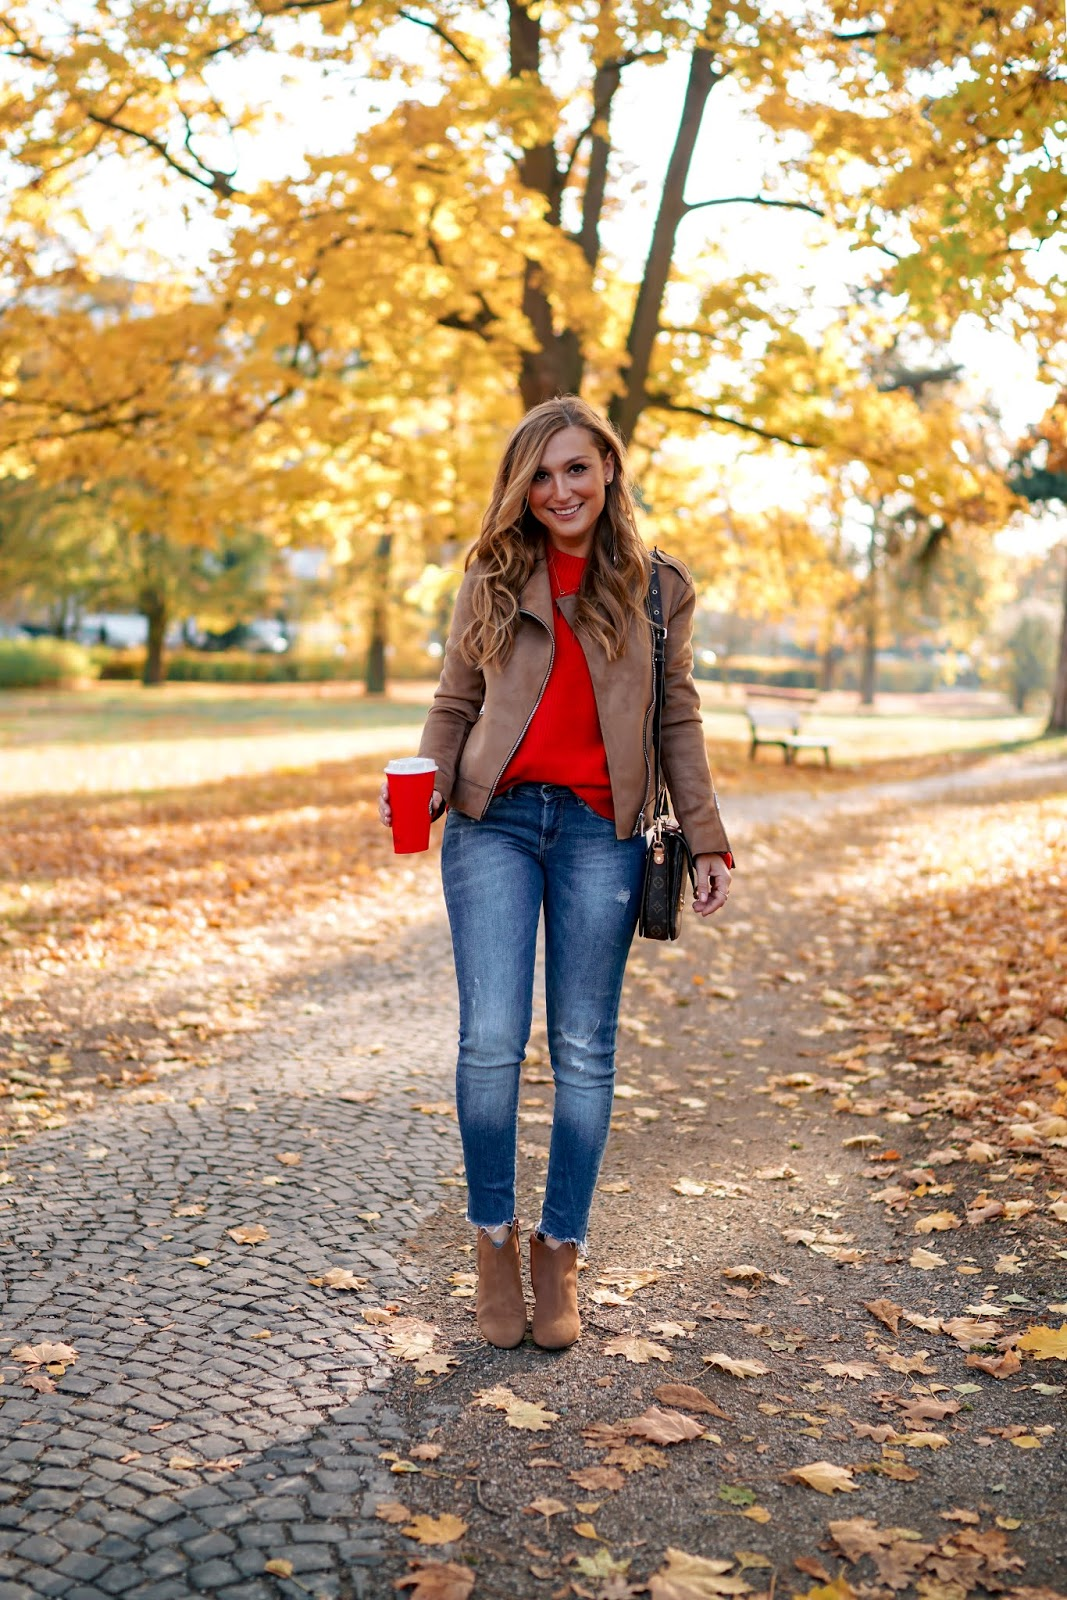 Roter-pullover-conleys-Louis-vuitton-metis-fashionblogger-Herbstoutfit-braune-lederjacke-braune-lederbooties-braune-Boots-stiefeletten-in-braun (3)